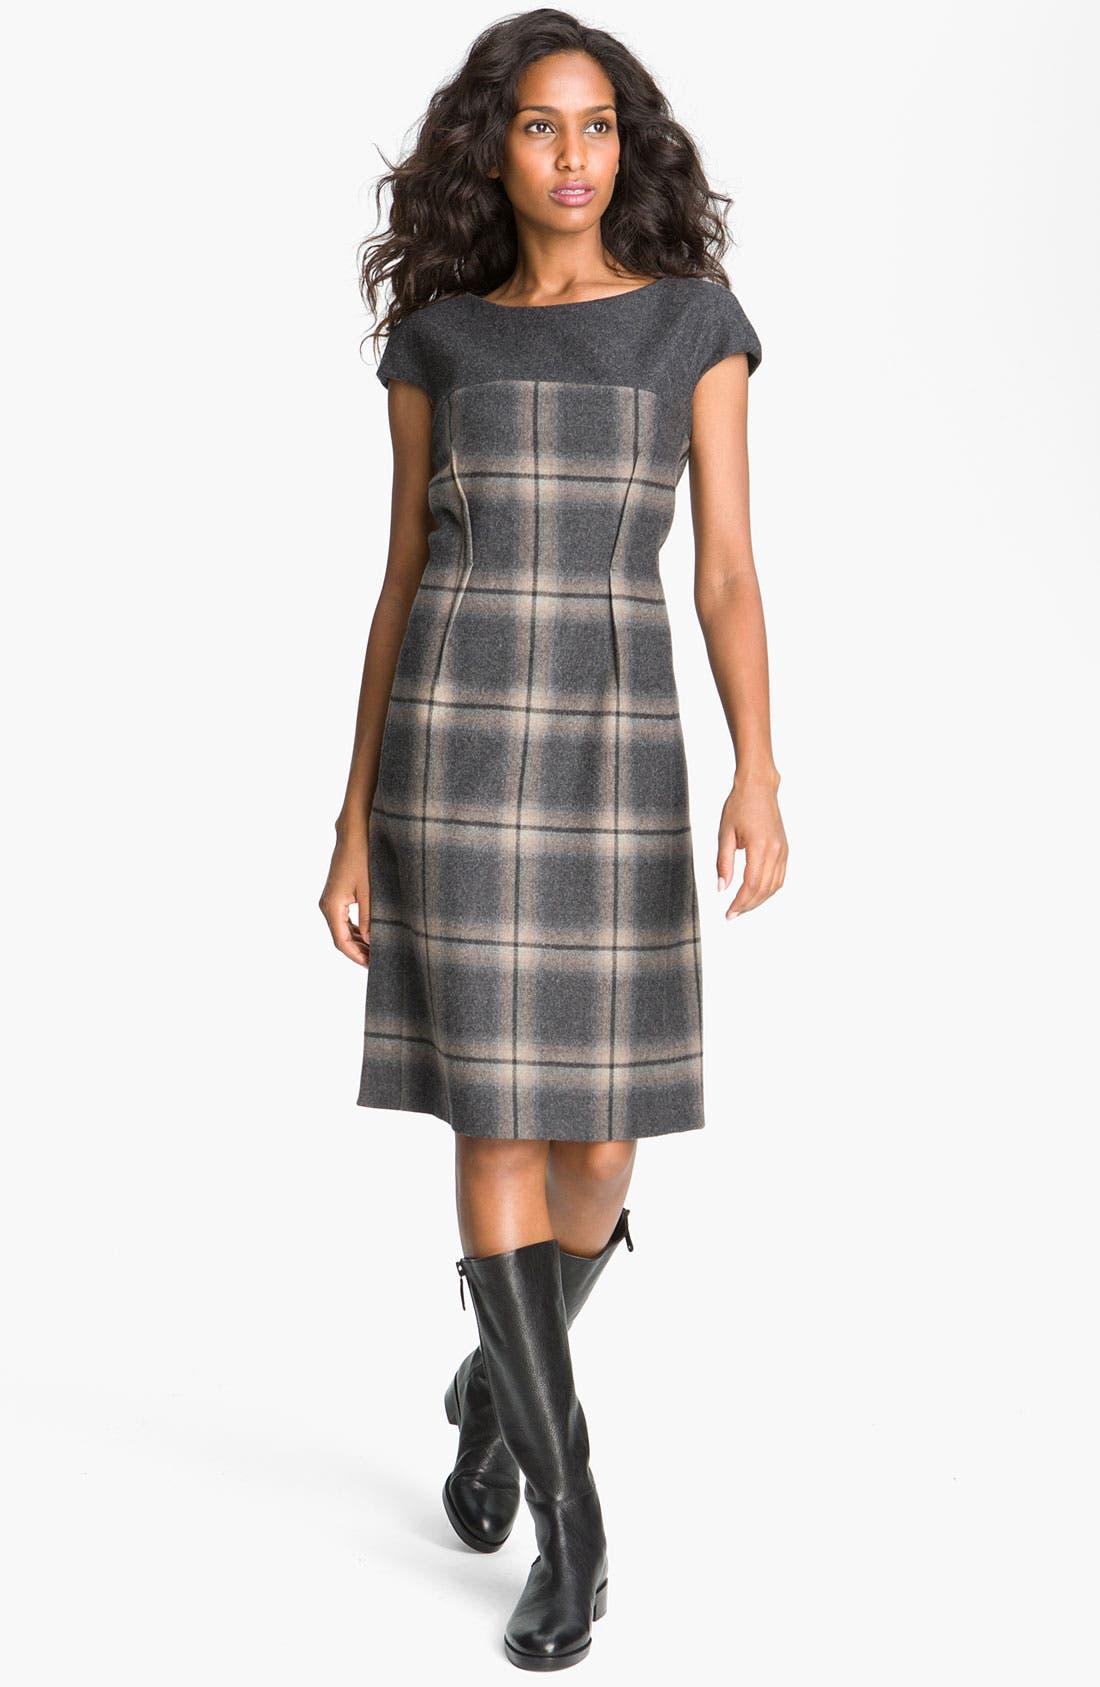 Alternate Image 1 Selected - Weekend Max Mara 'Elicia' Dress